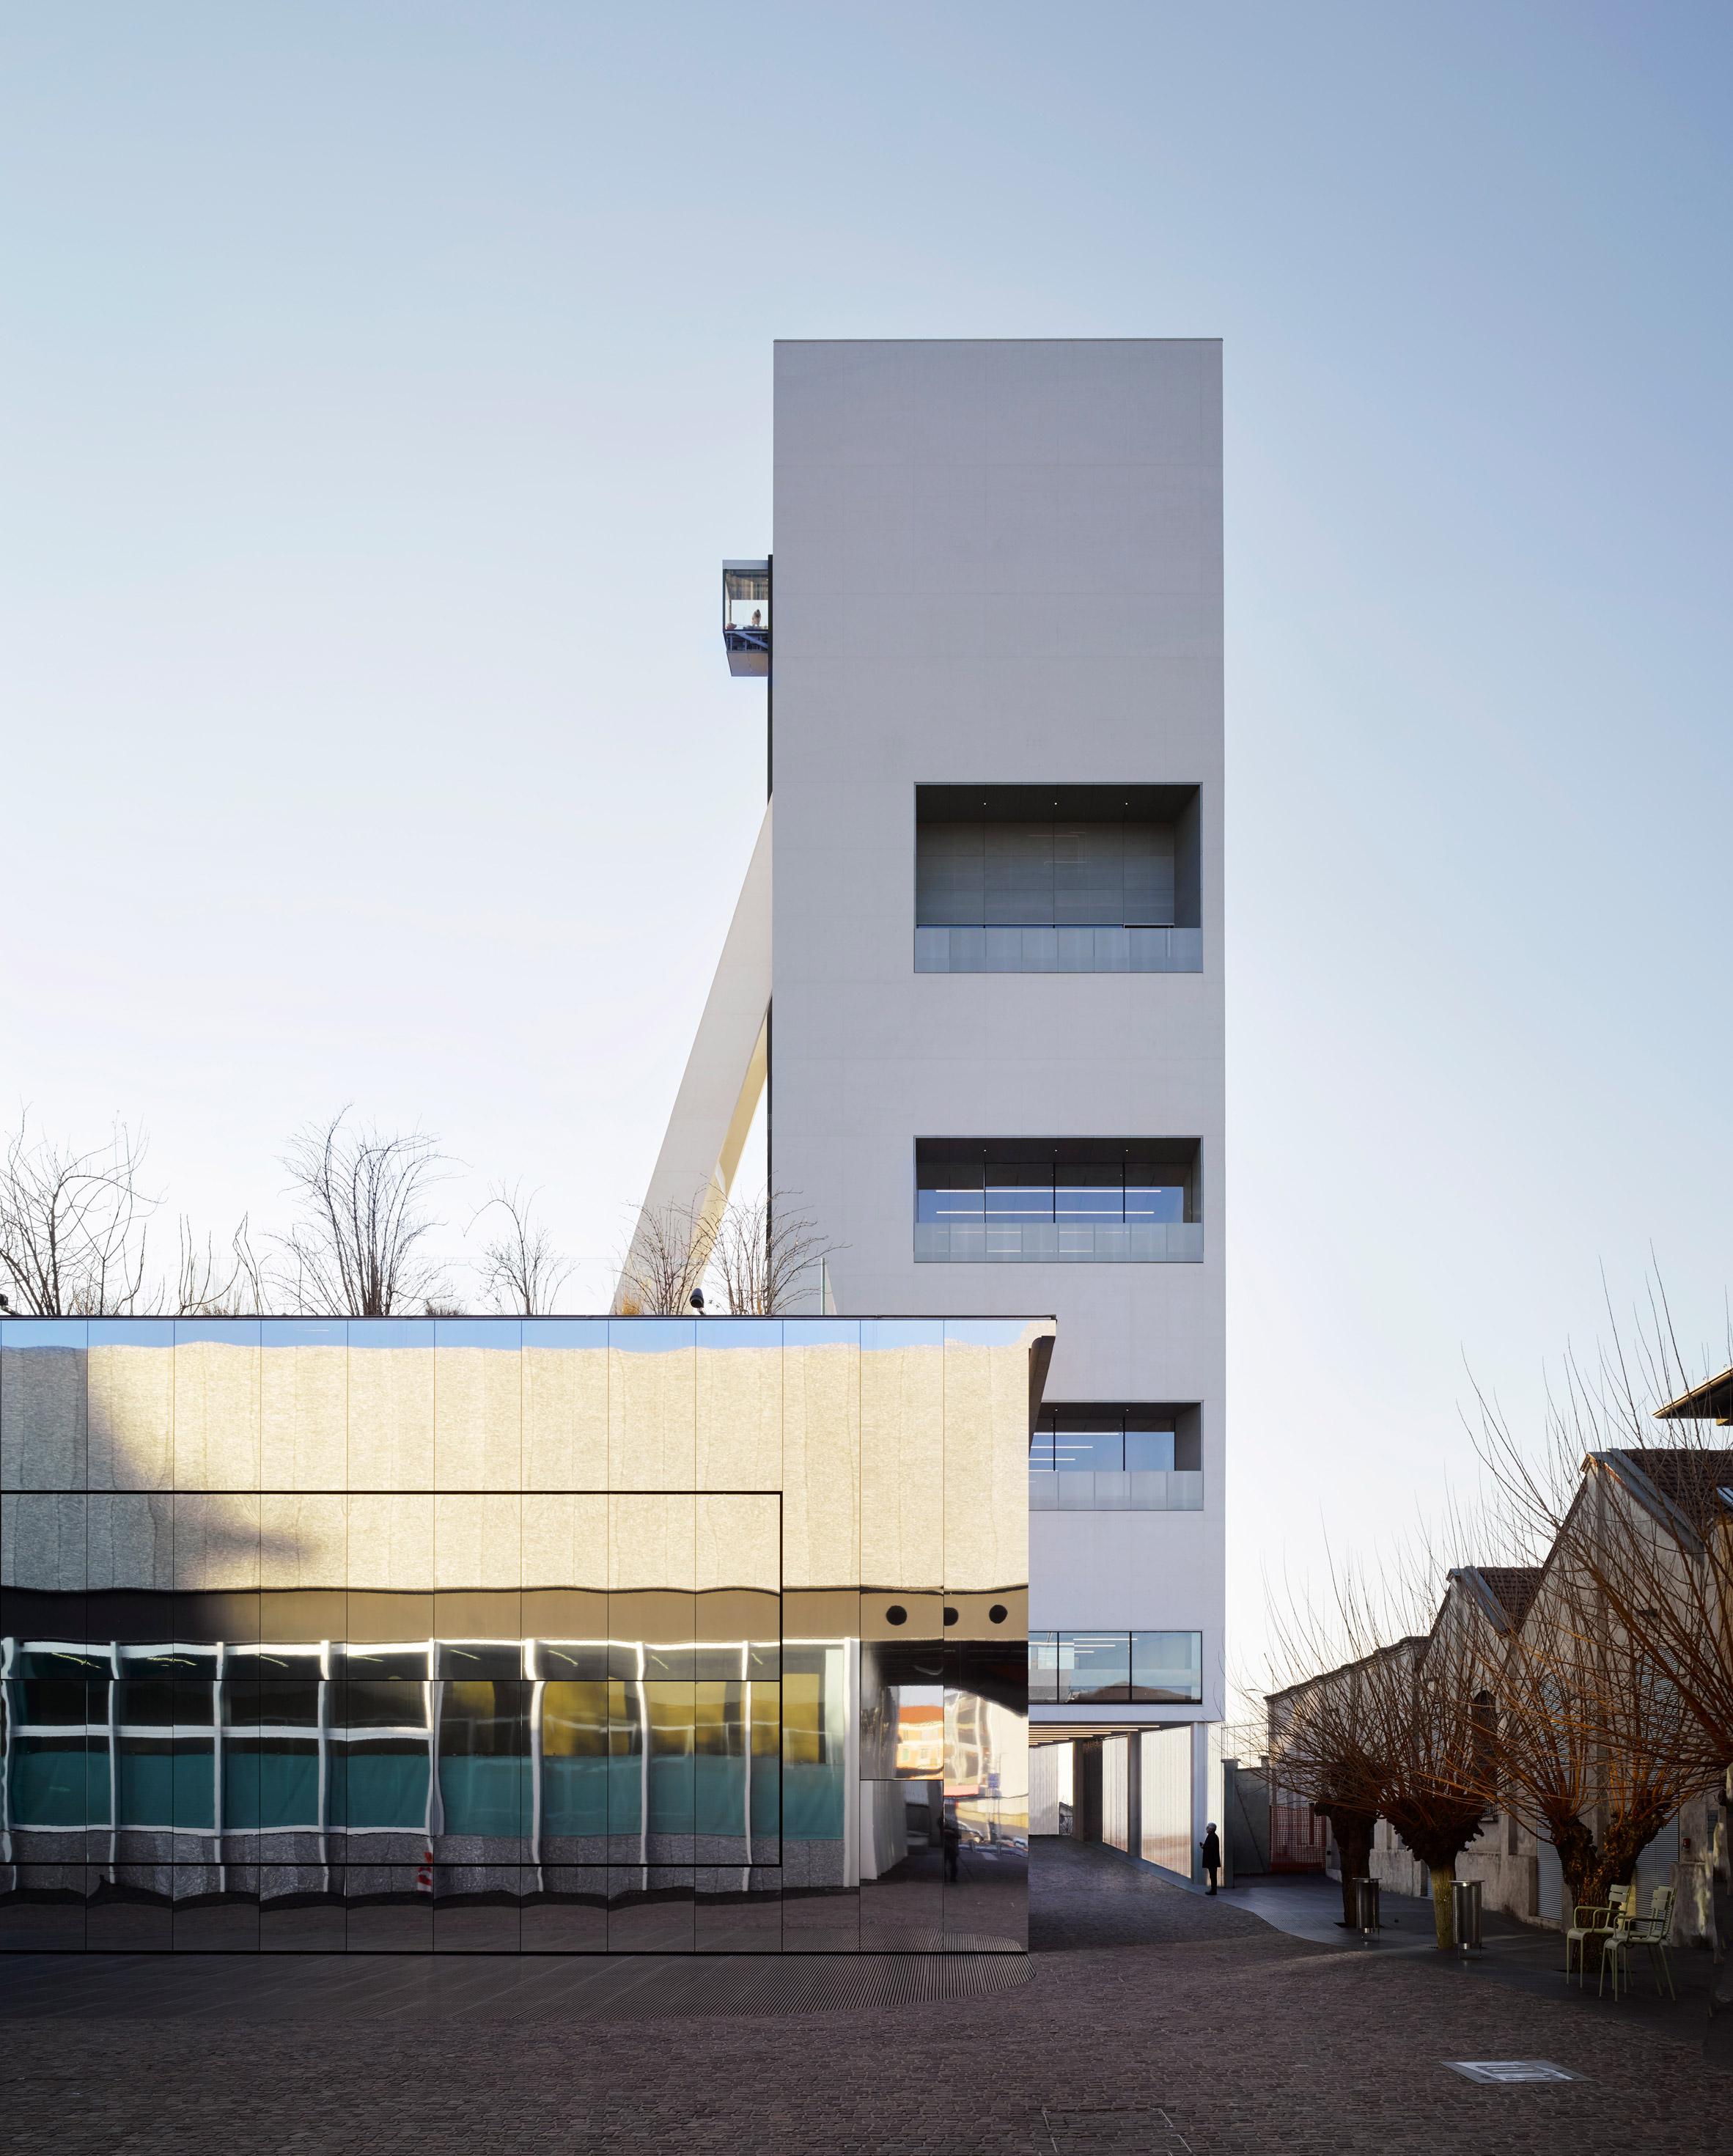 Torre Fondazione Prada by OMA